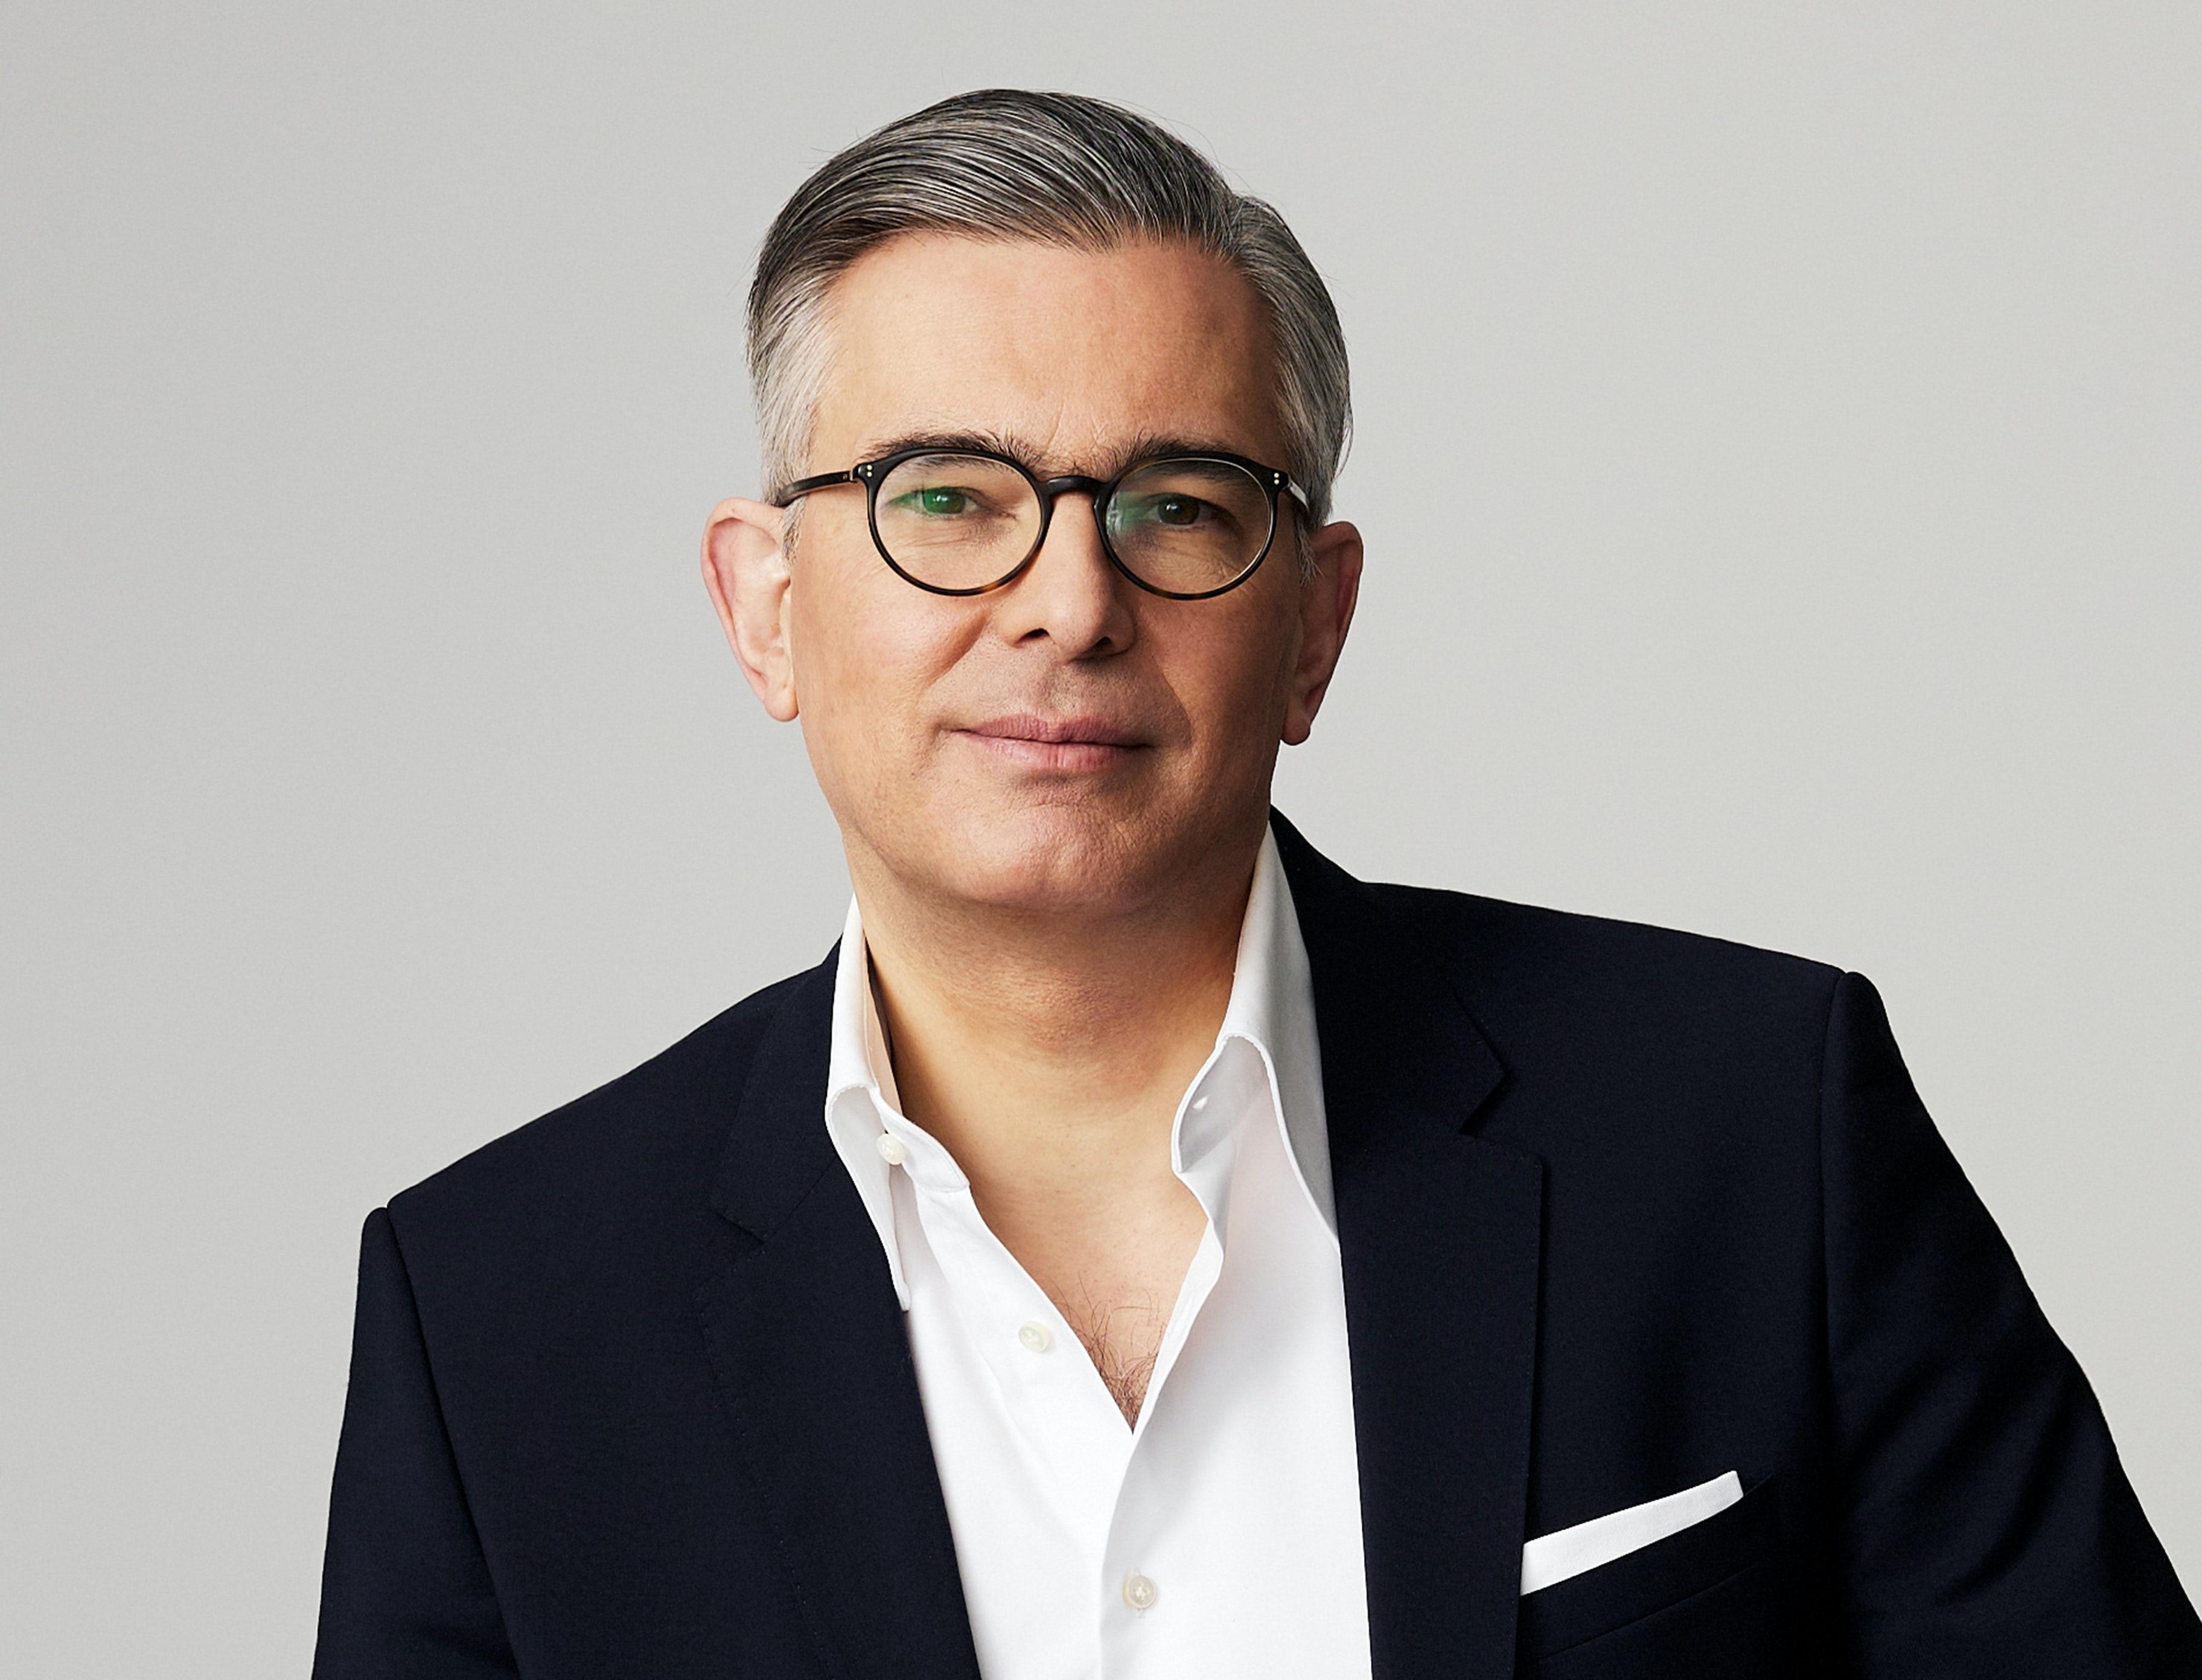 Mytheresa's chief executive Michael Kliger. Mytheresa.